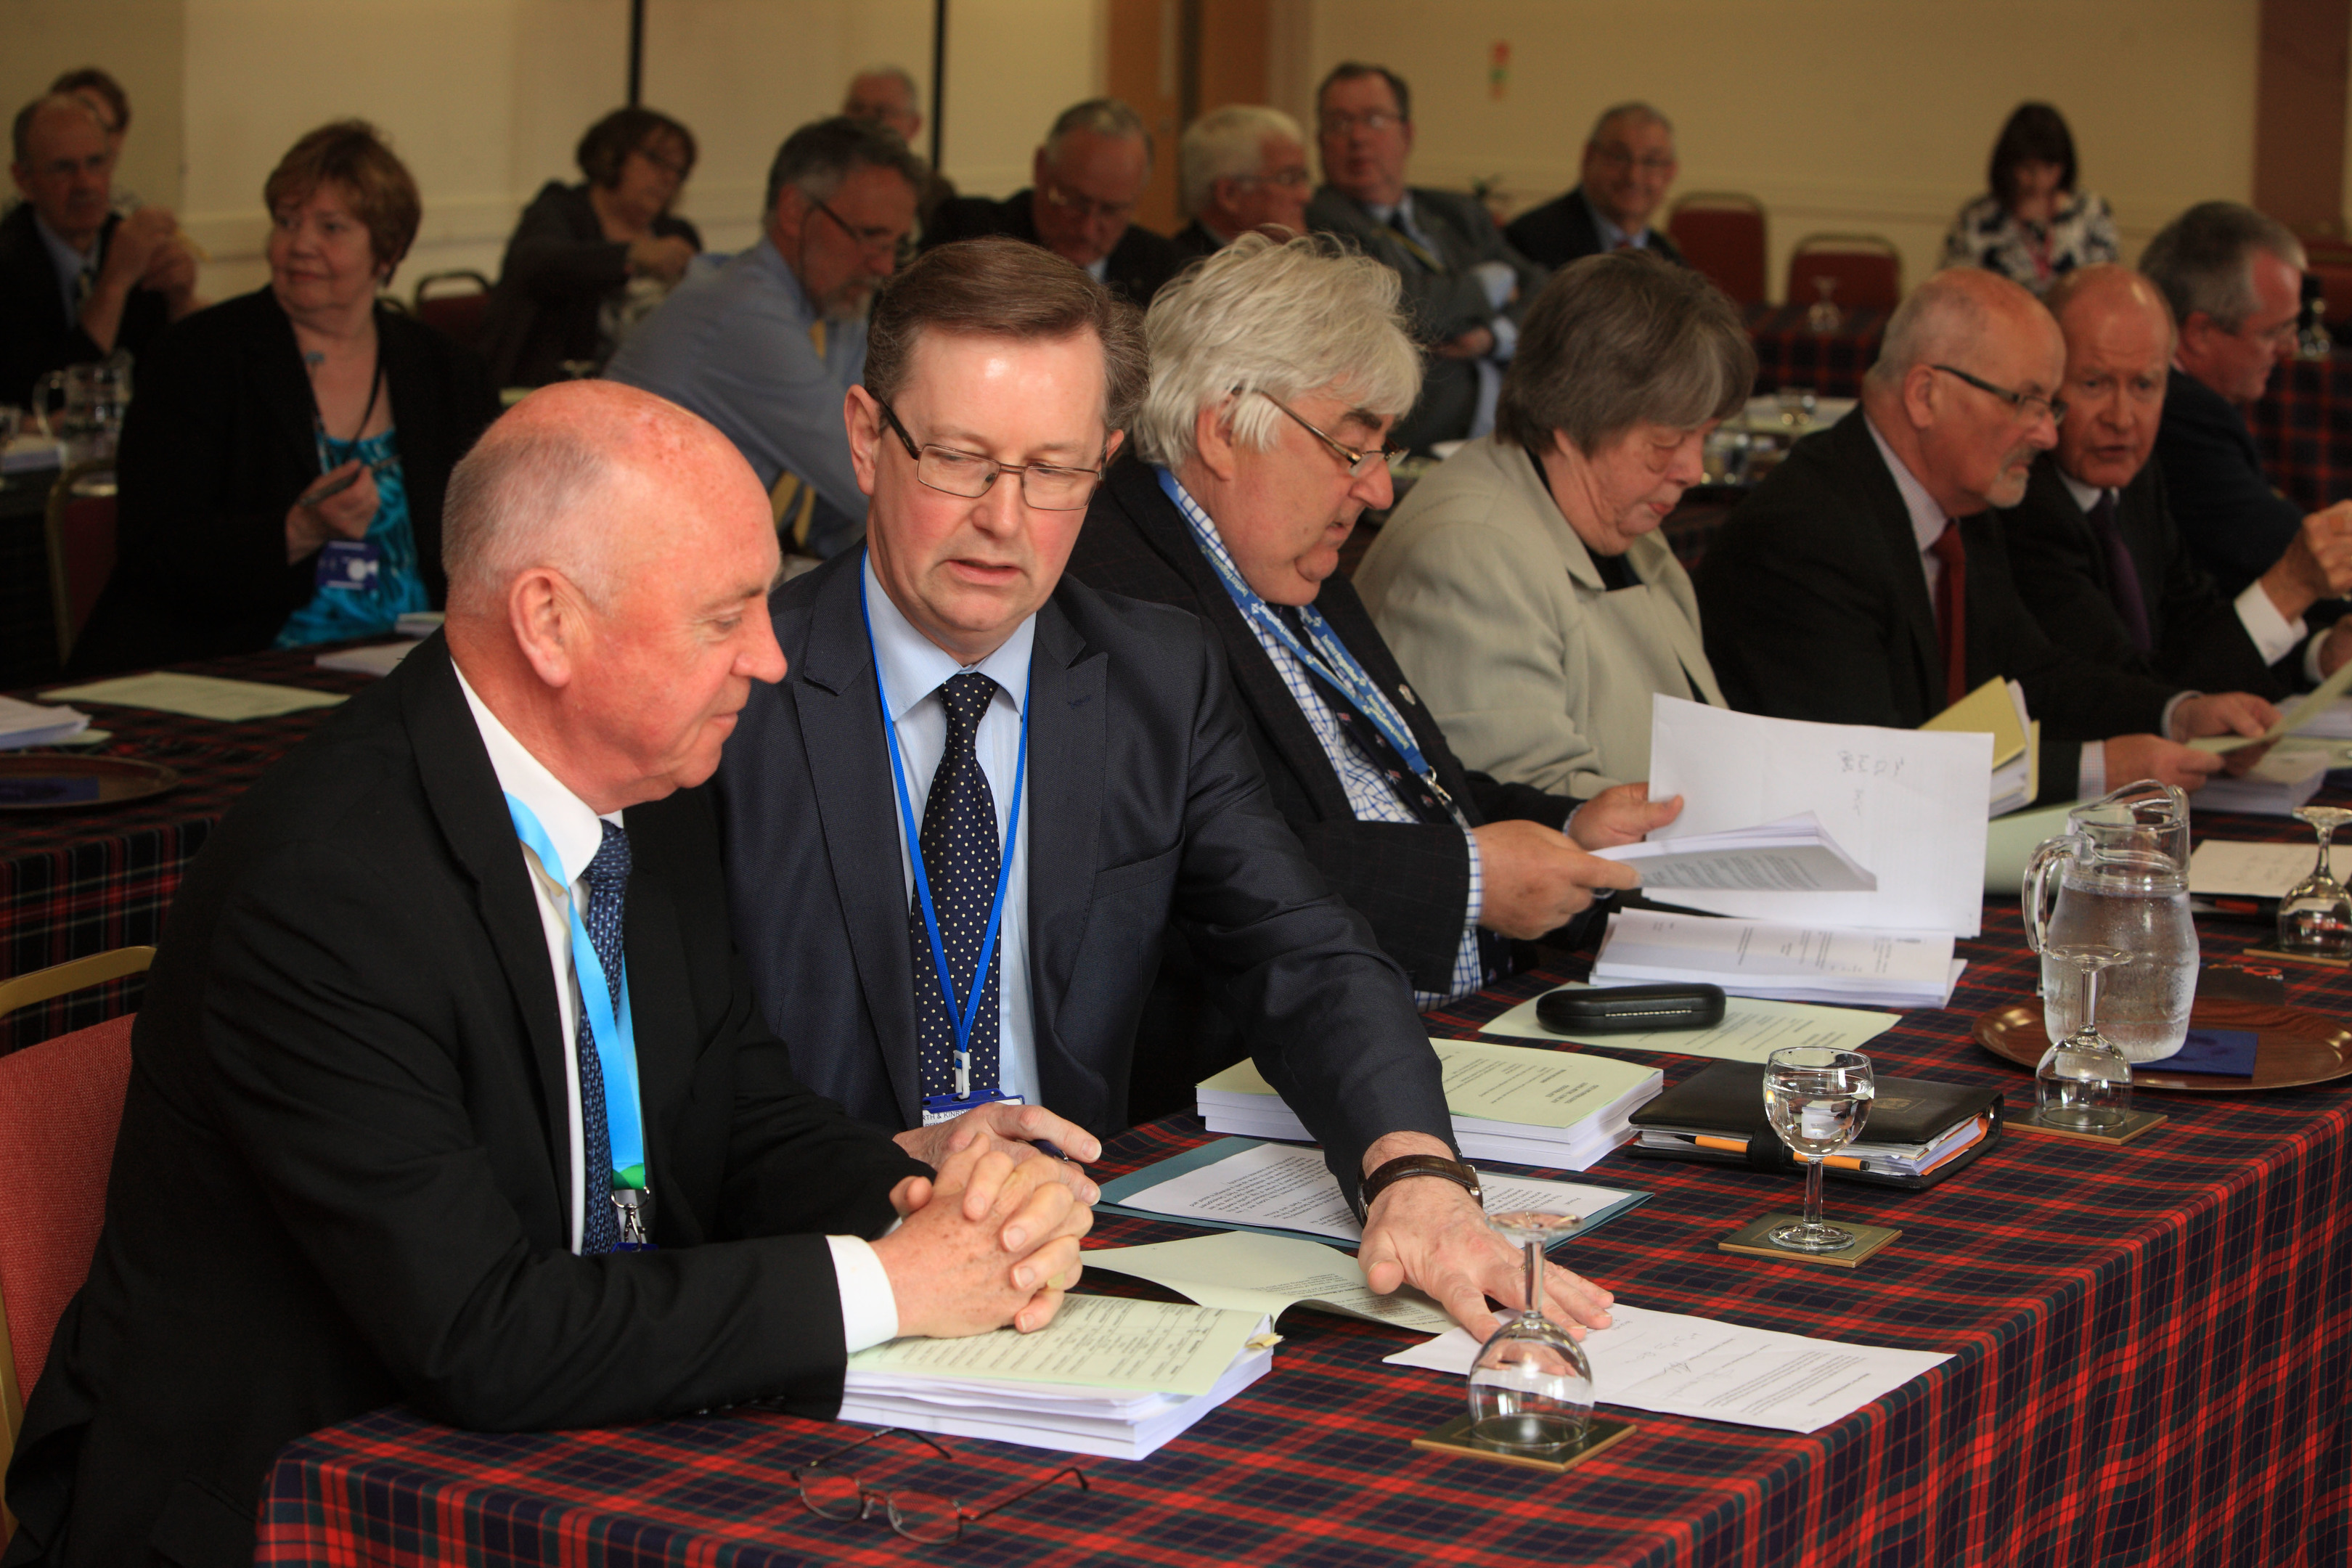 Mac Roberts (left) and Alexander Stewart at the meeting.